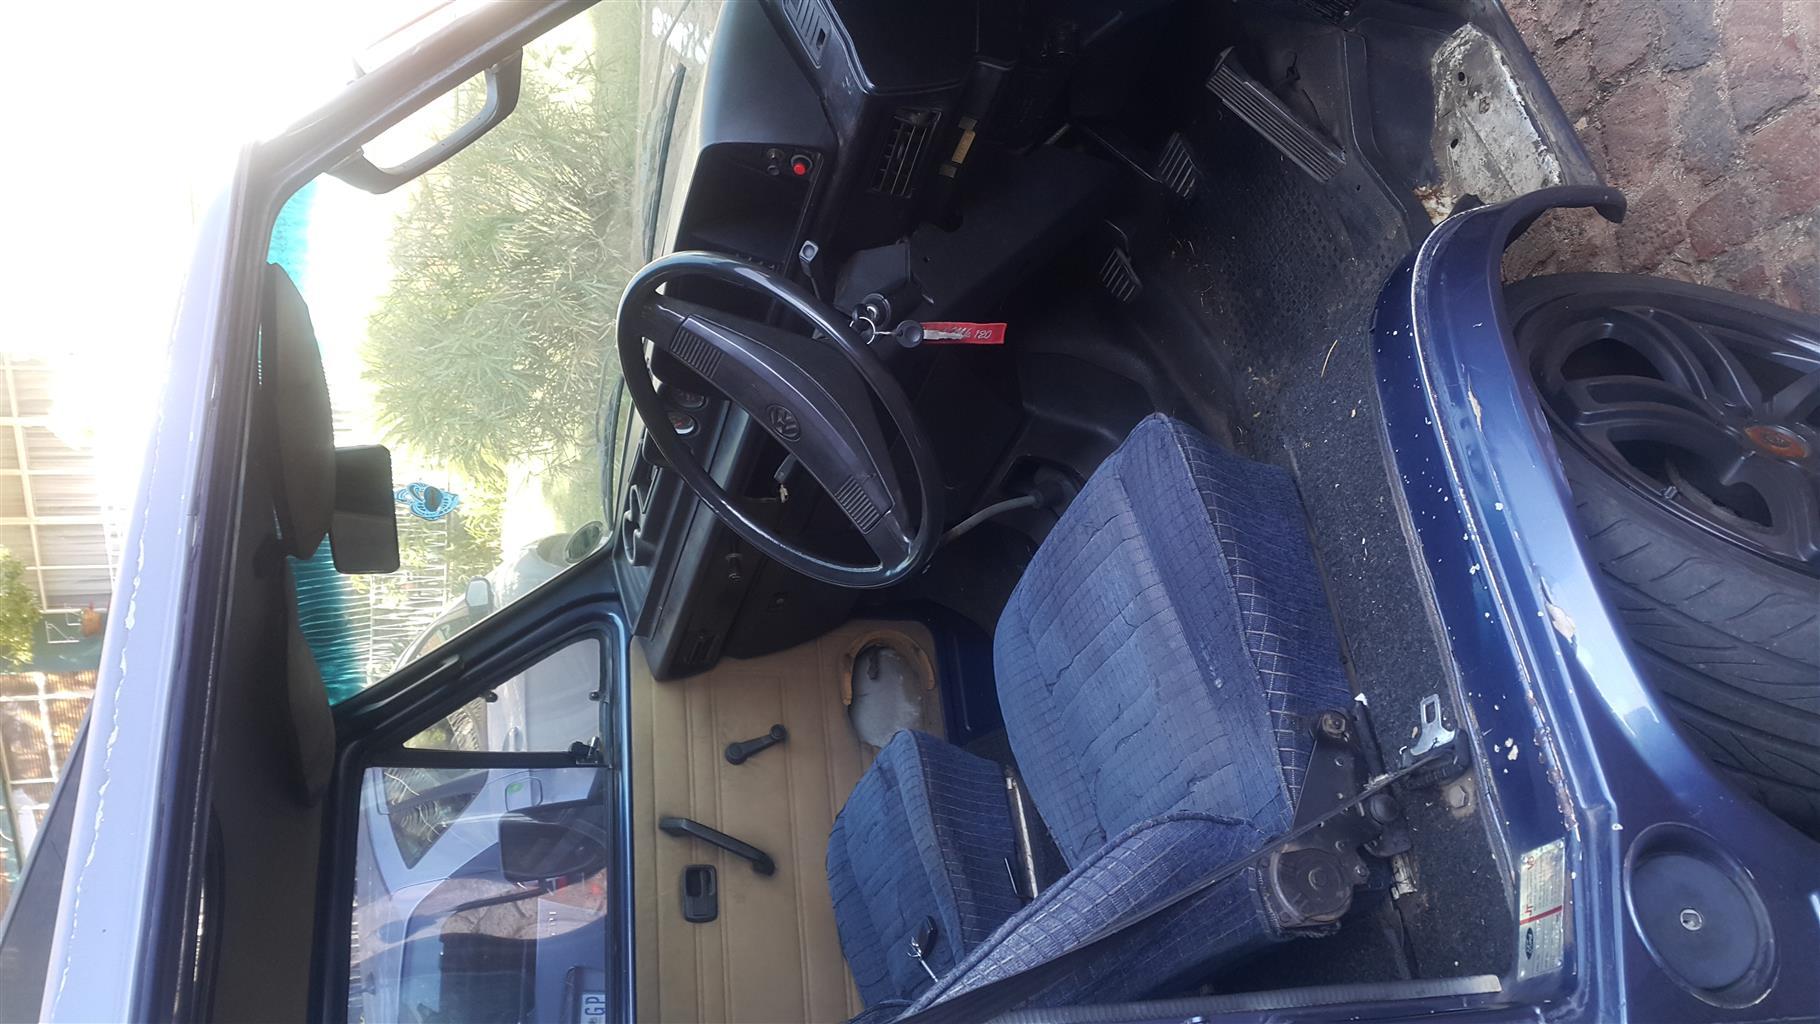 Vw Transporter Double cab